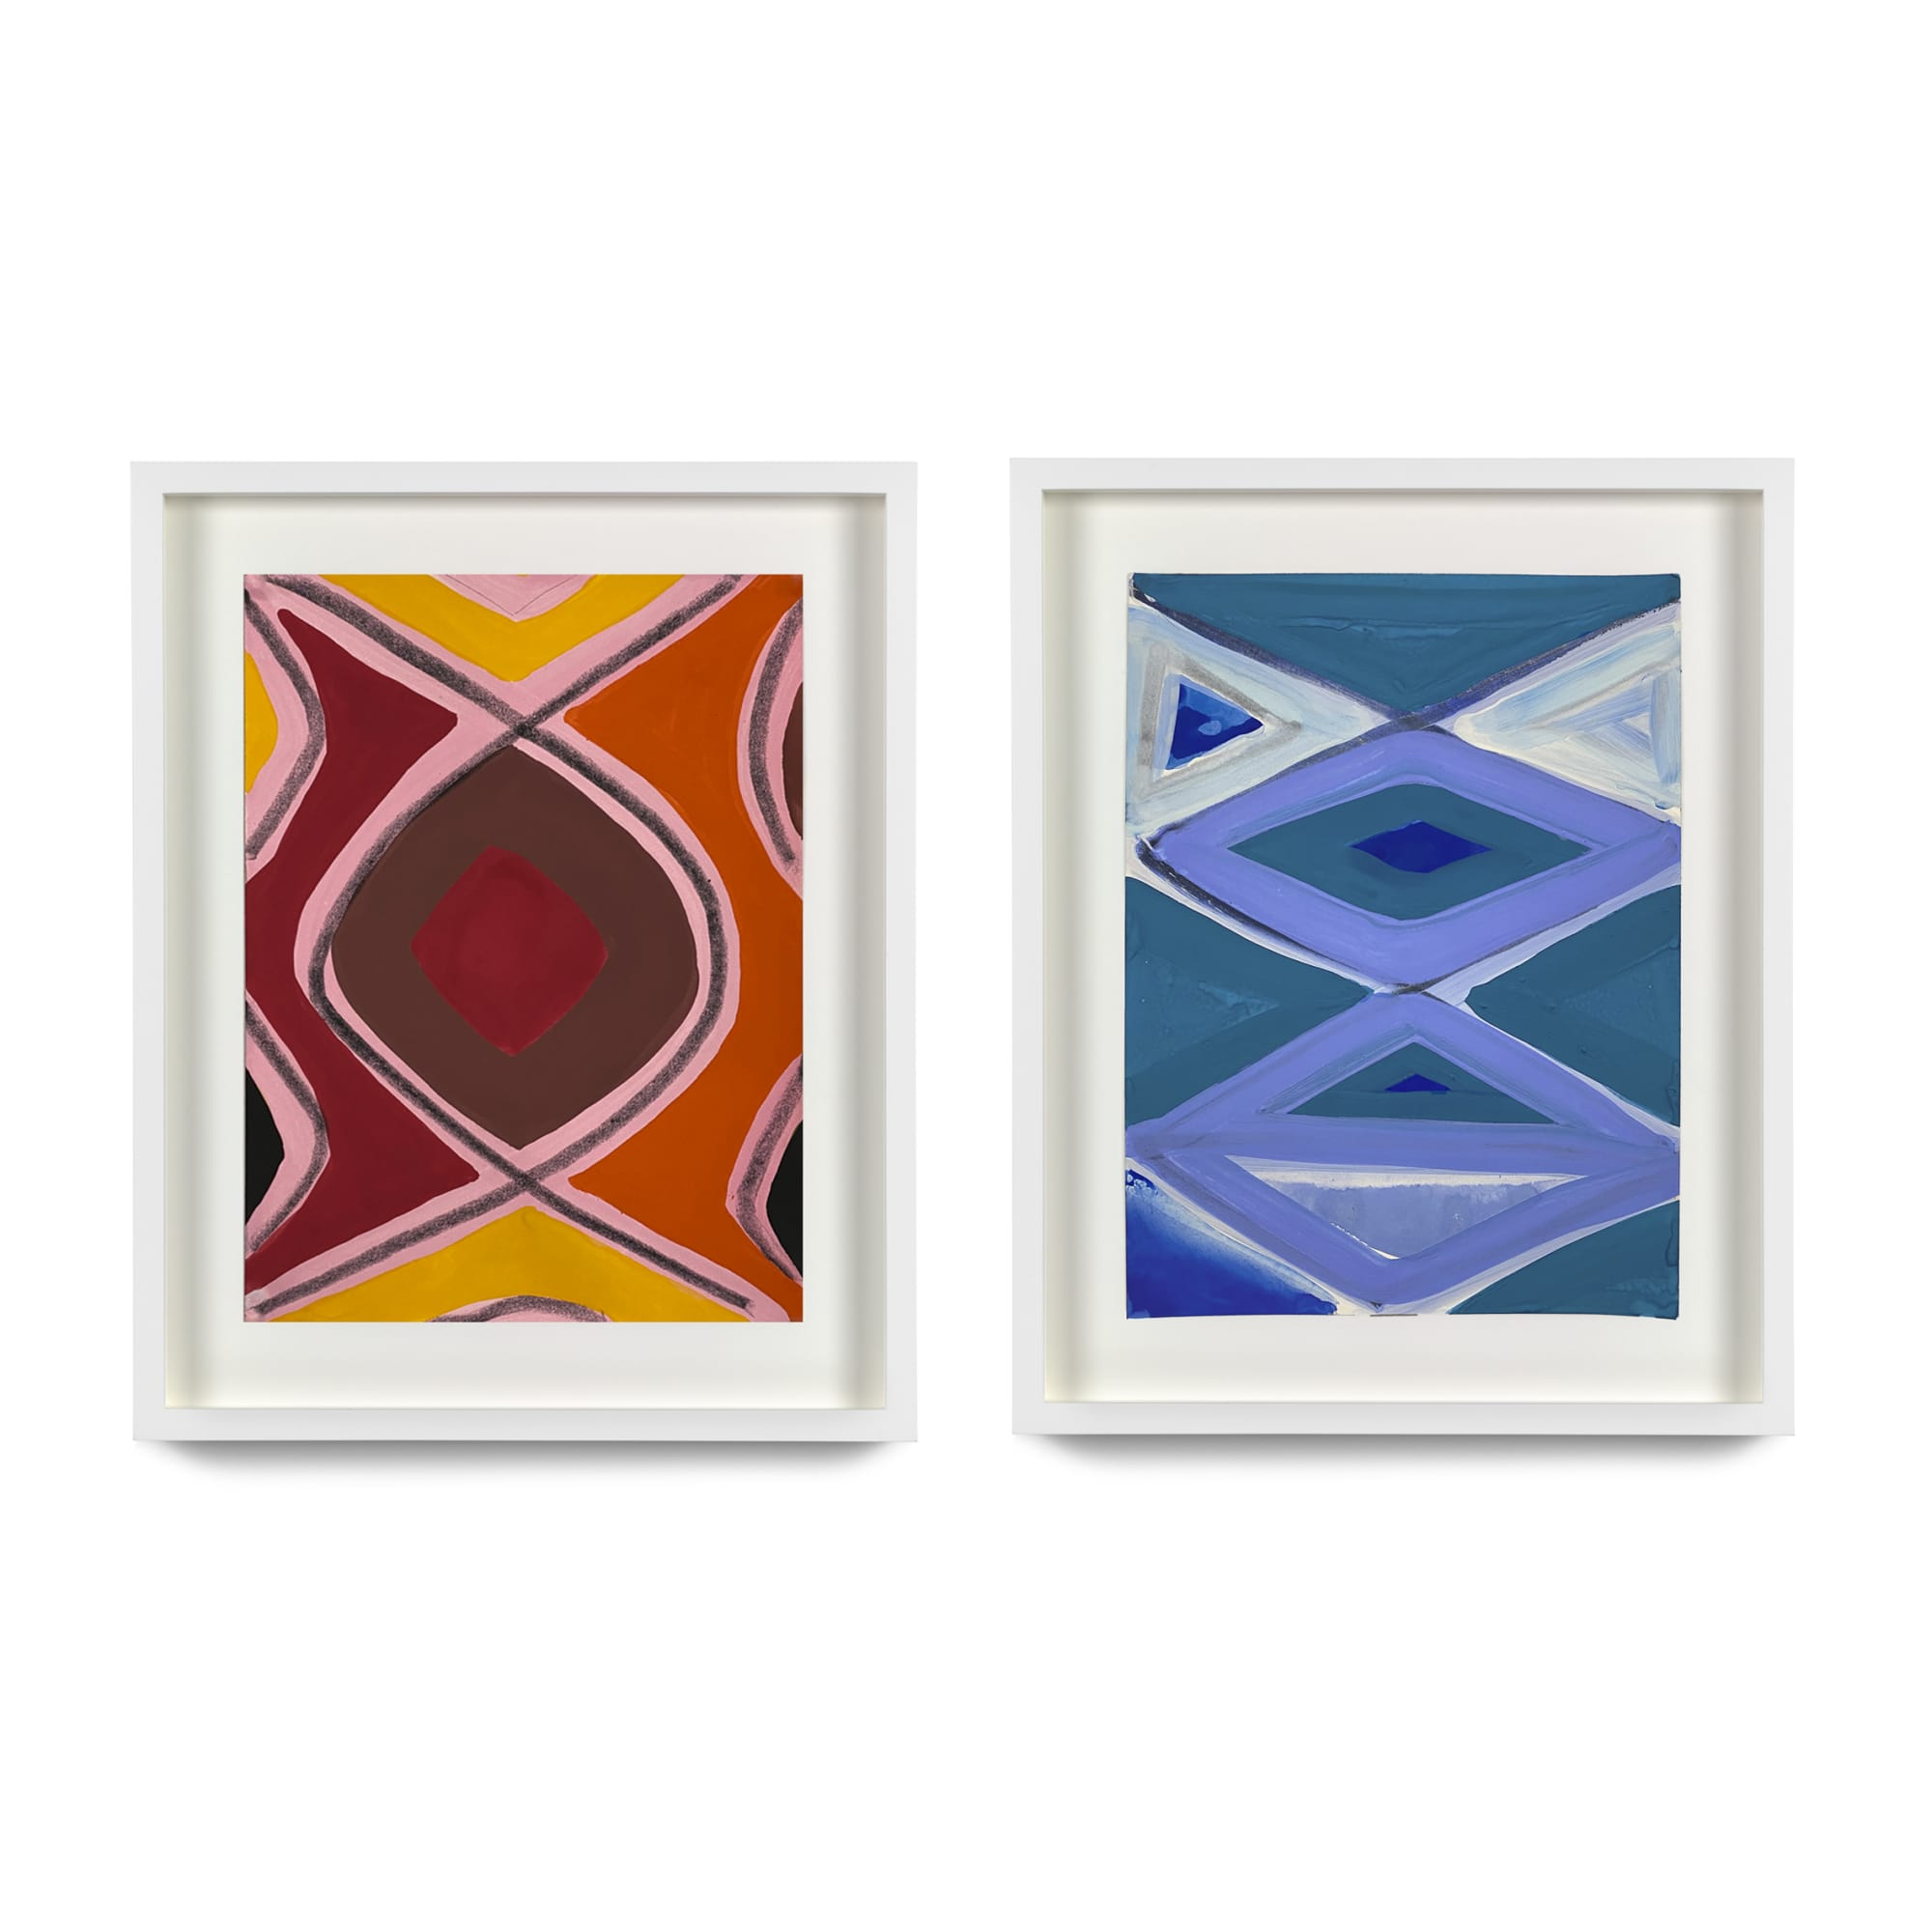 Marina Adams: Works on Paper (2016–2021)